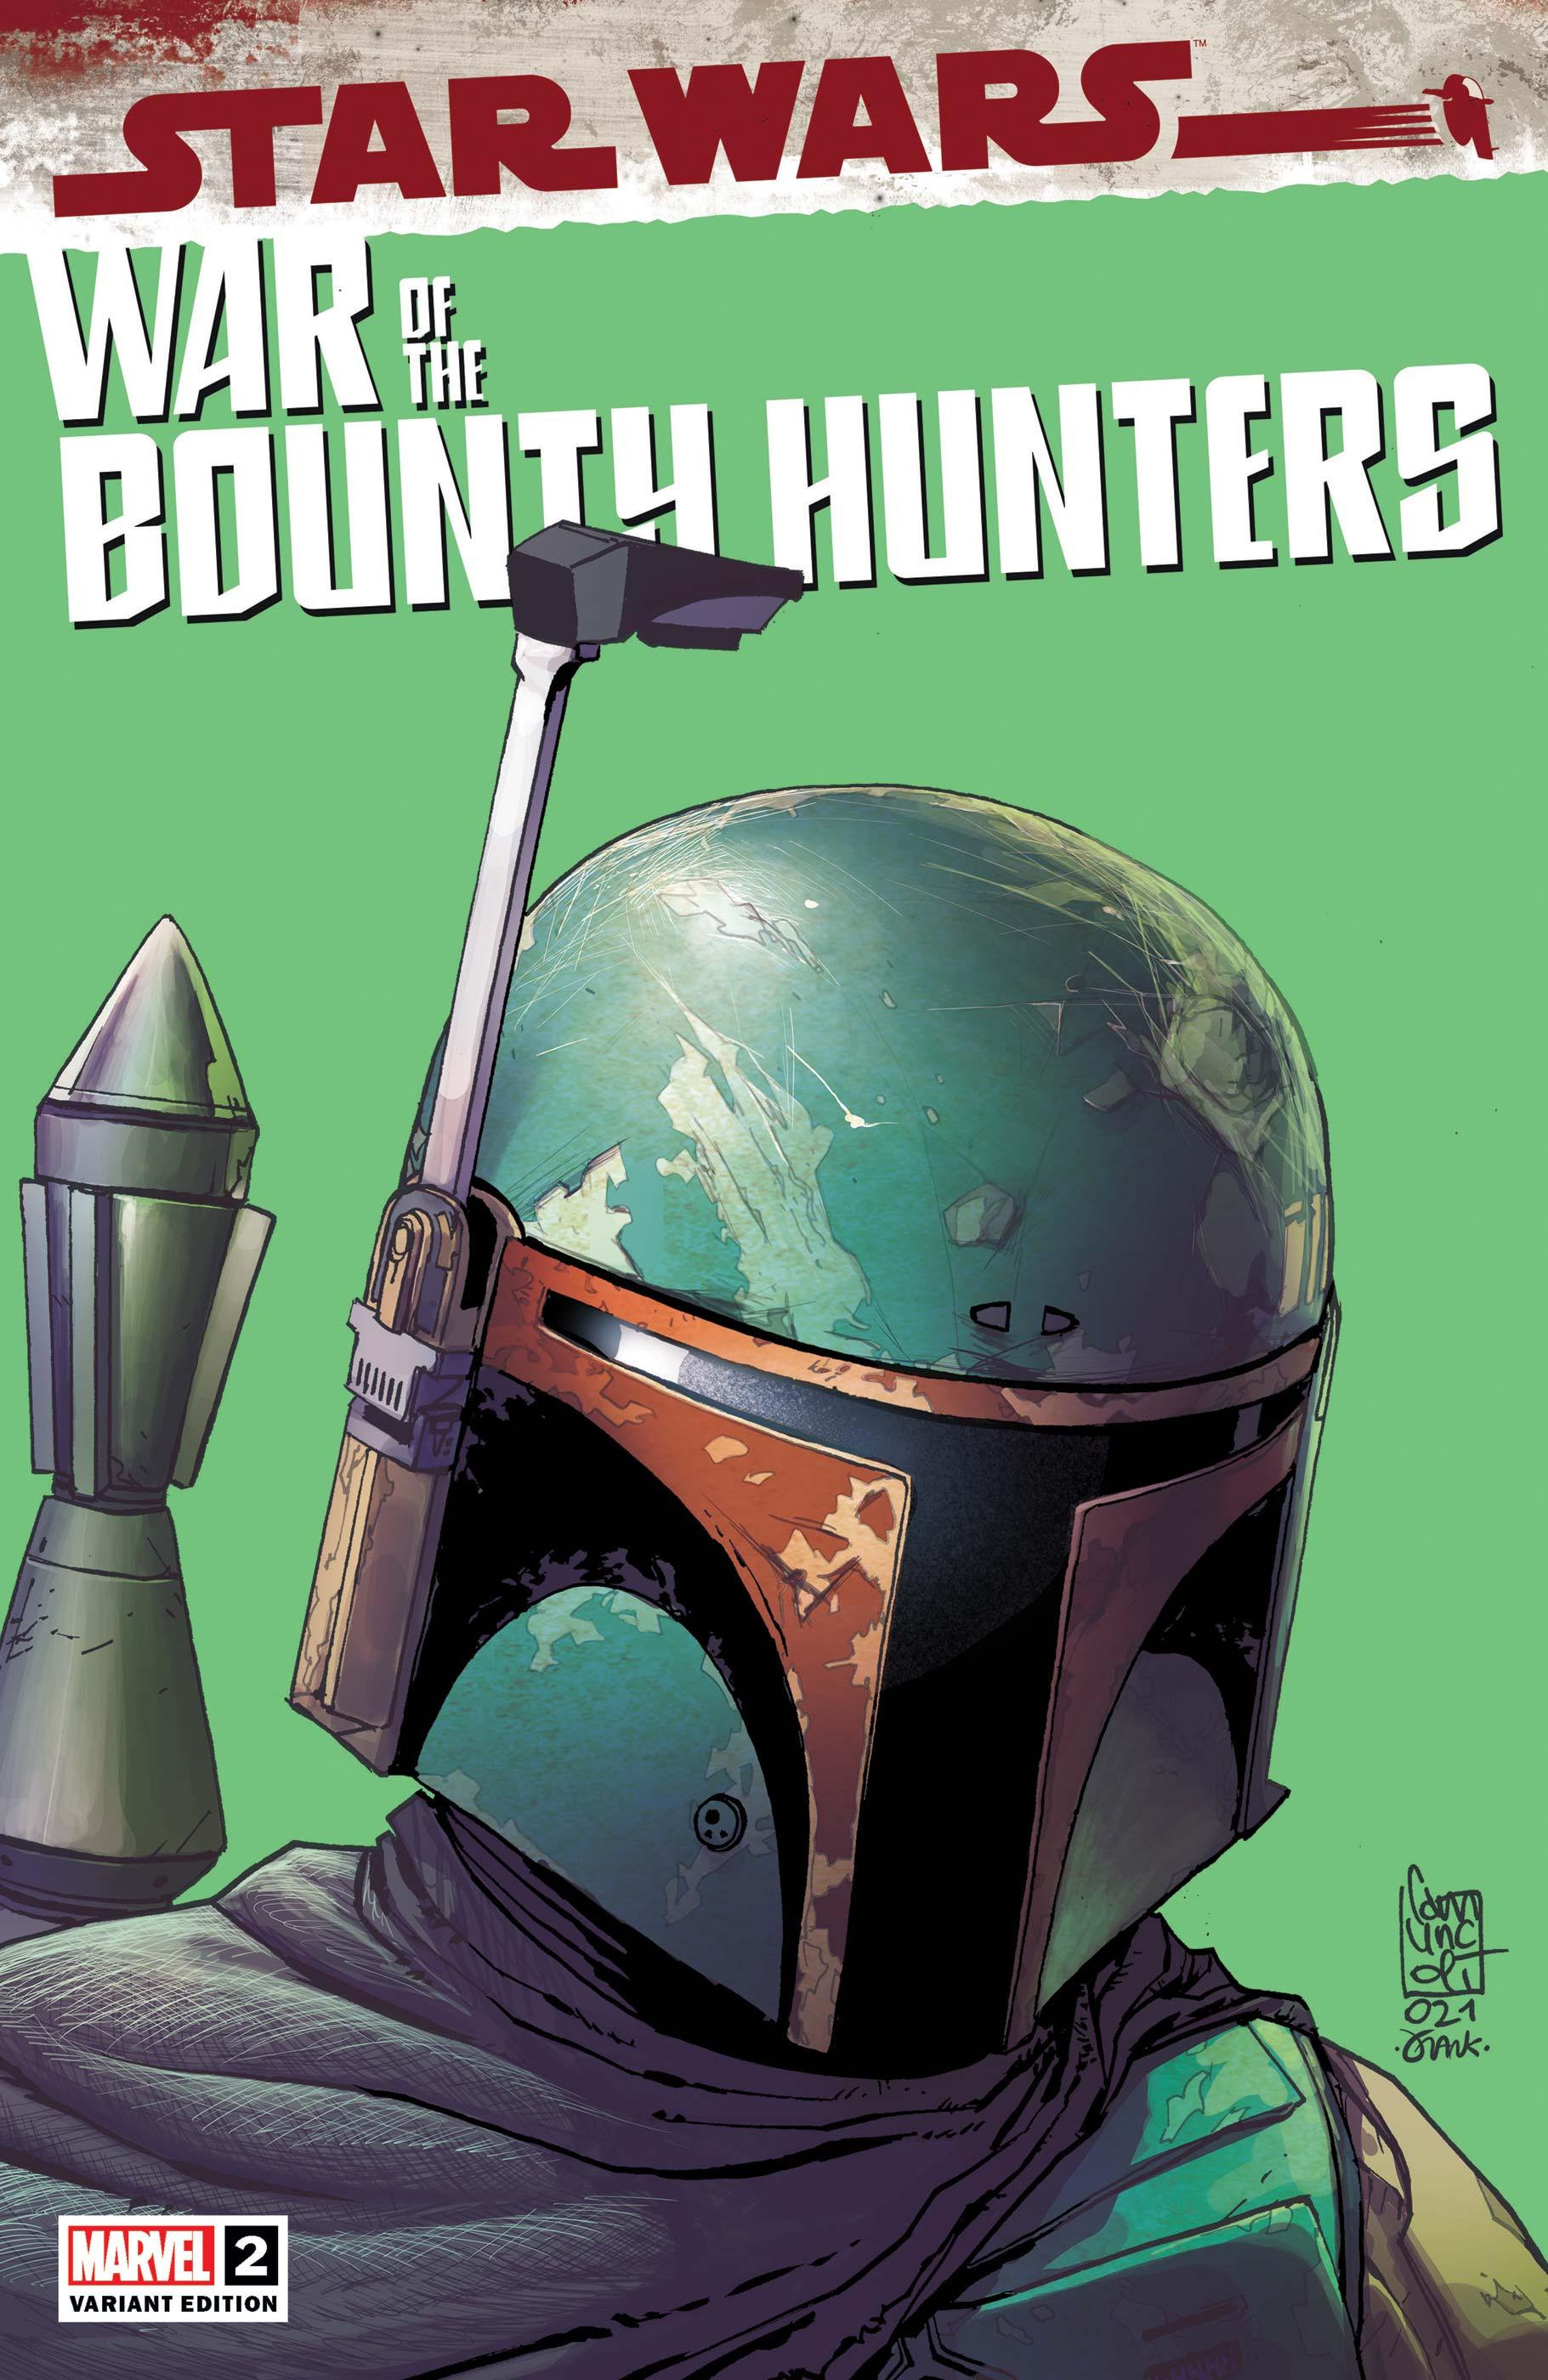 Star Wars: War of the Bounty Hunters (2021) #2 (Variant)